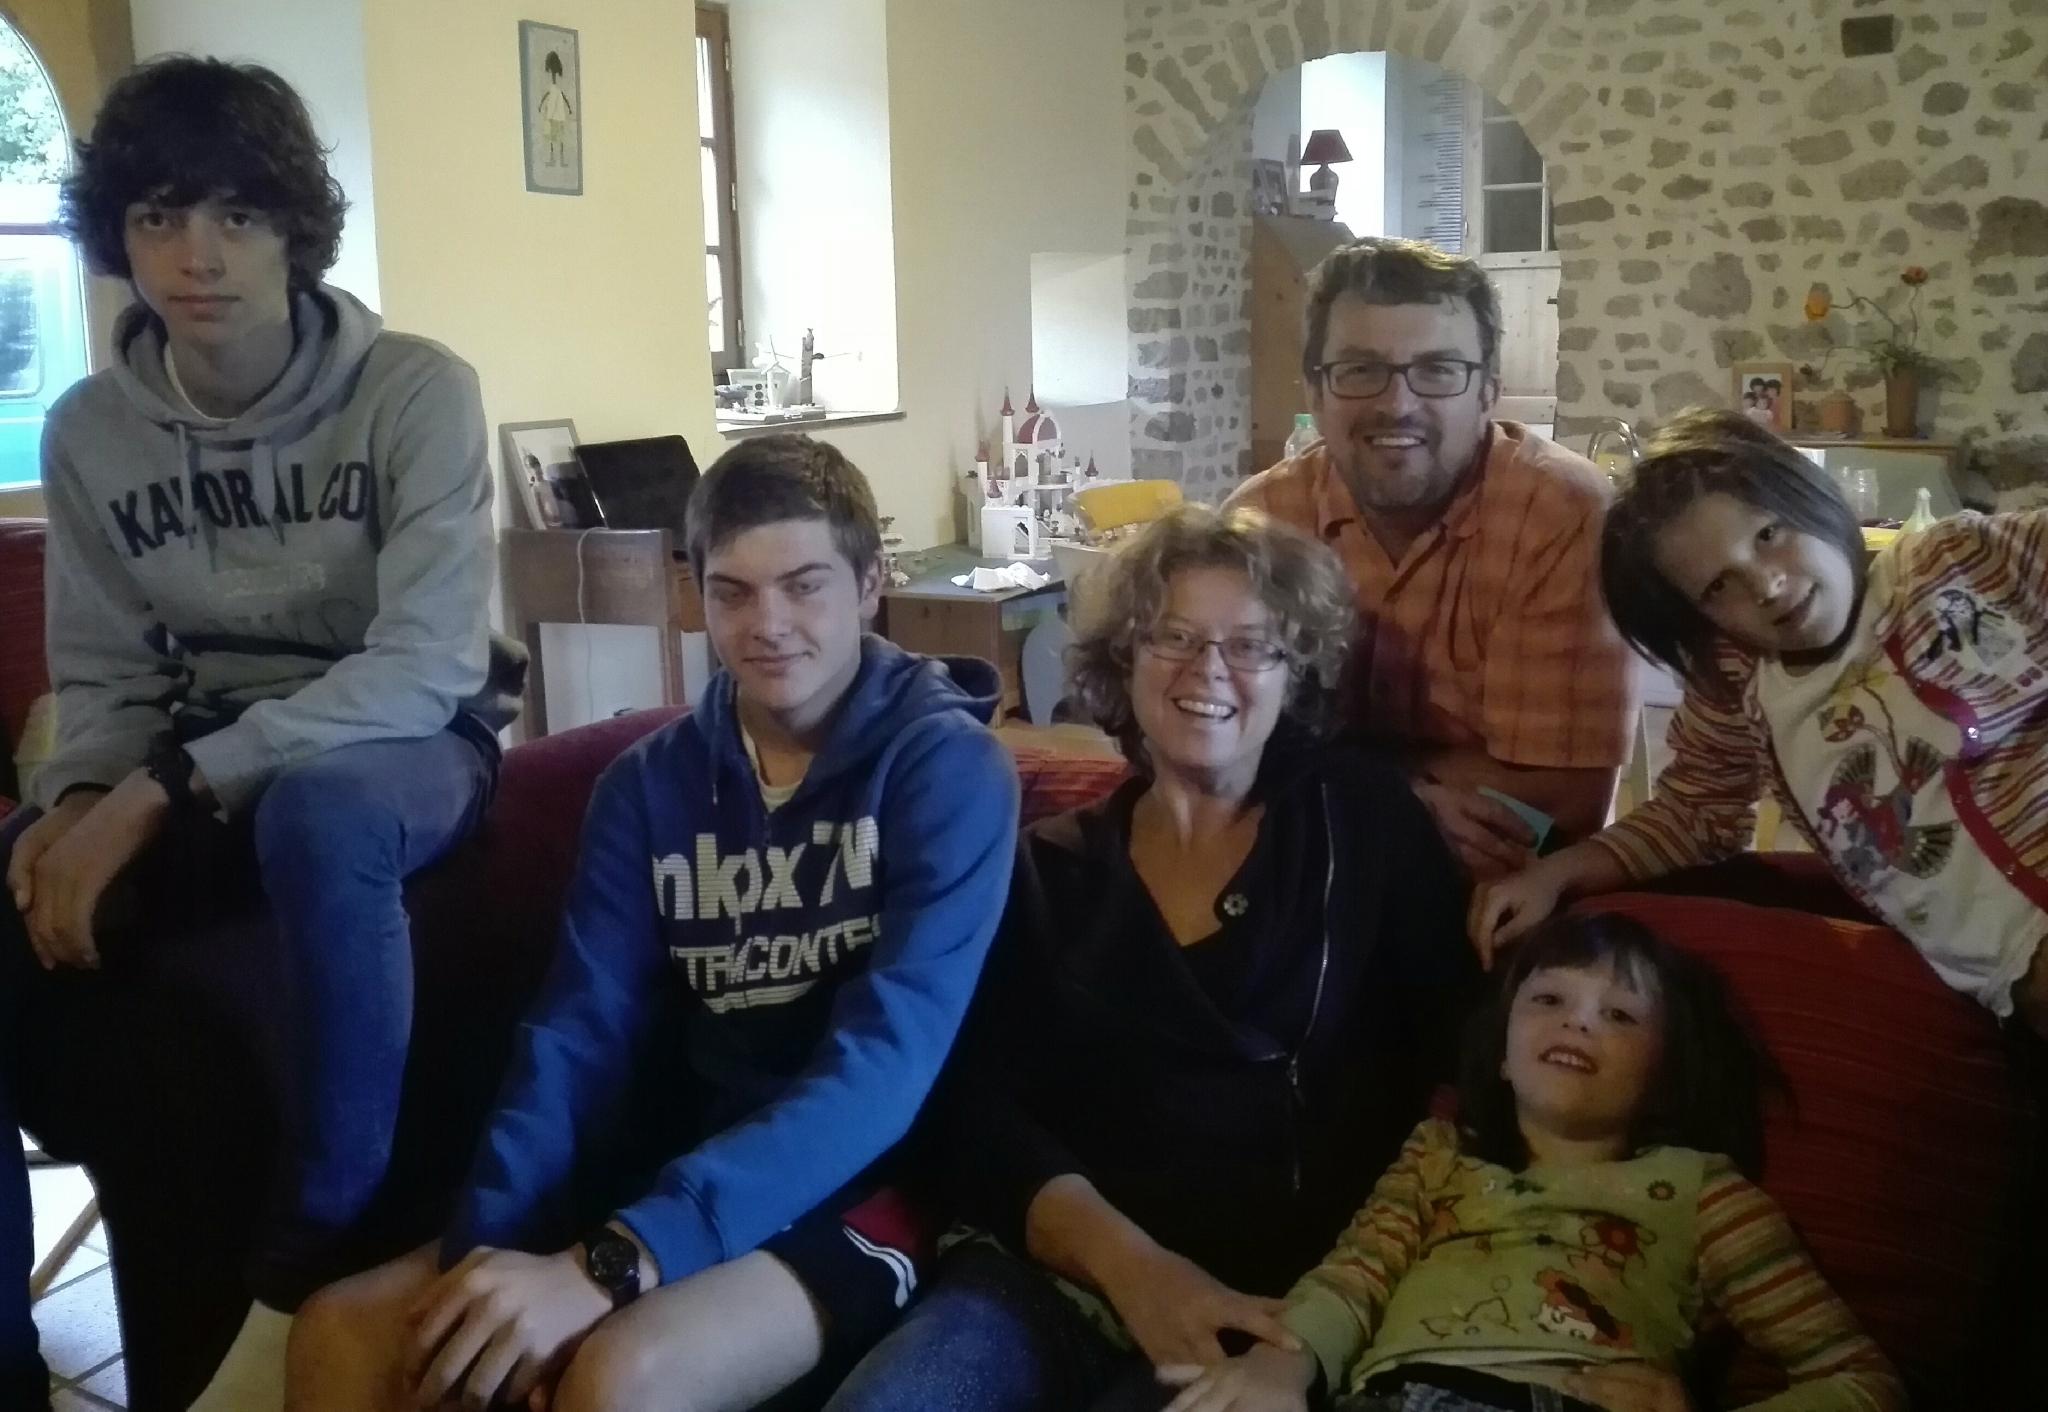 Géraldine, Jean-Luc, Tom, Robin, Violette et Maya, 11 septembre